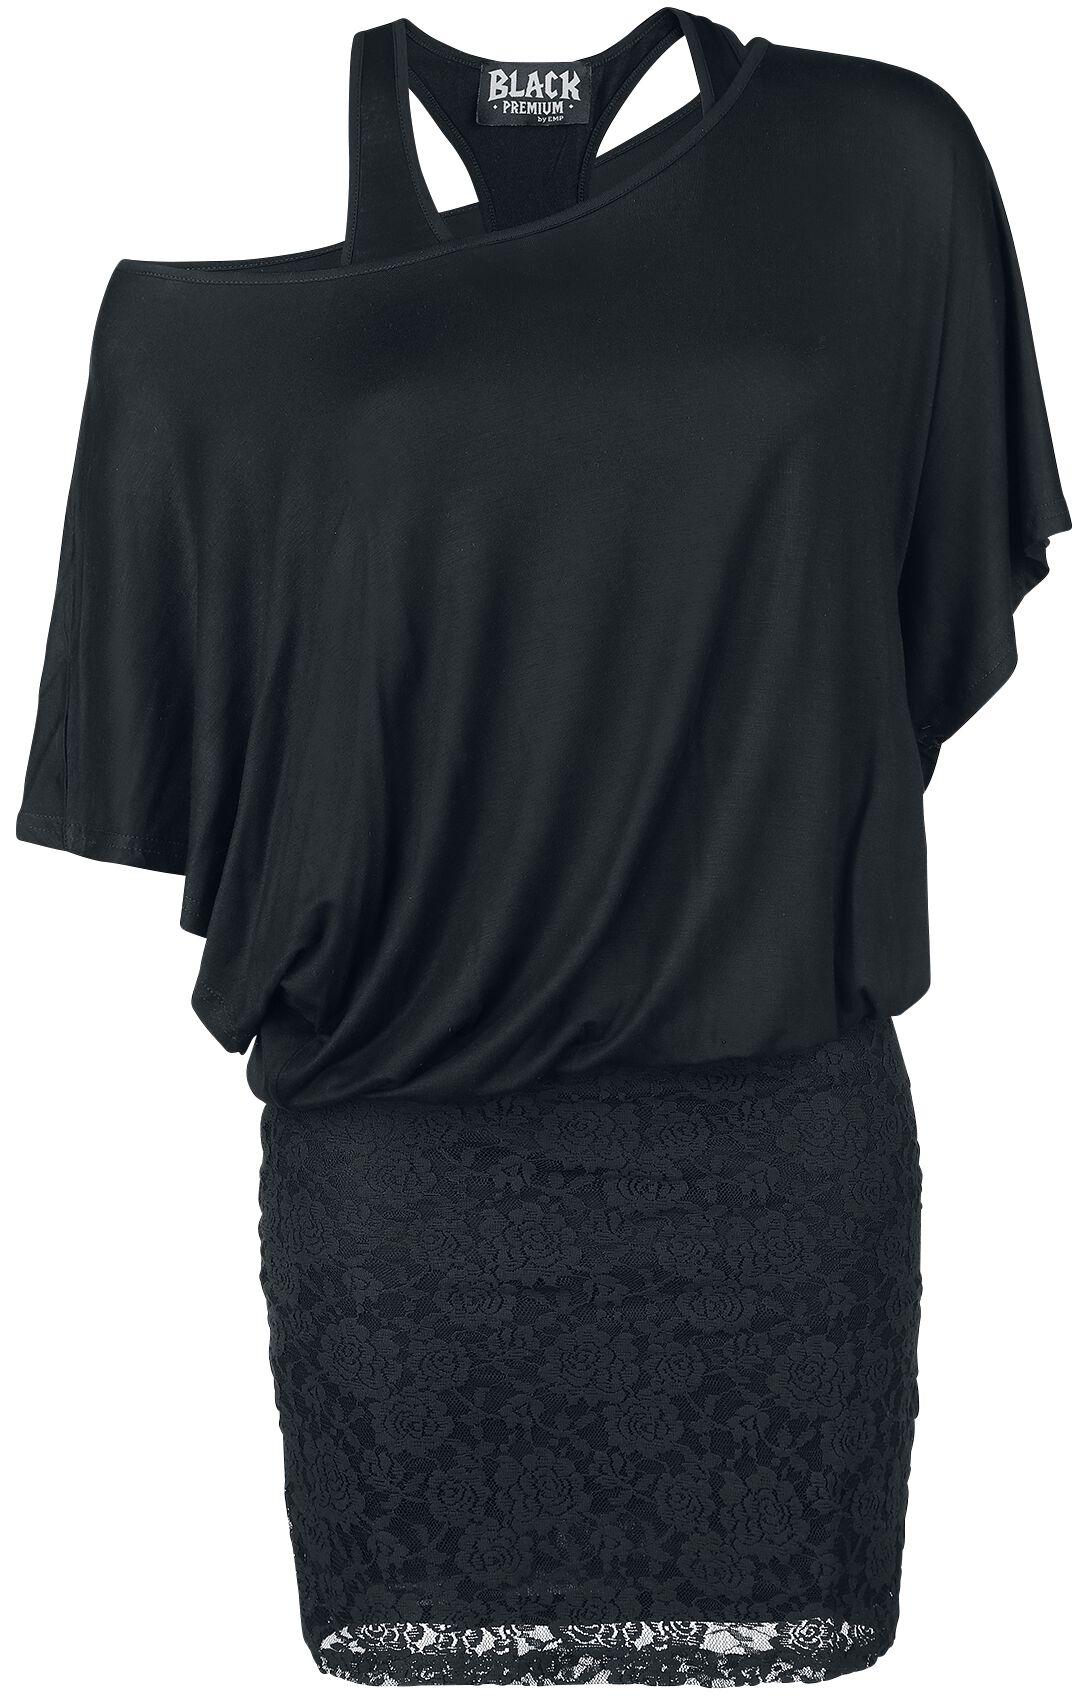 Image of   Black Premium by EMP Bat Double Layer Dress Kjole sort